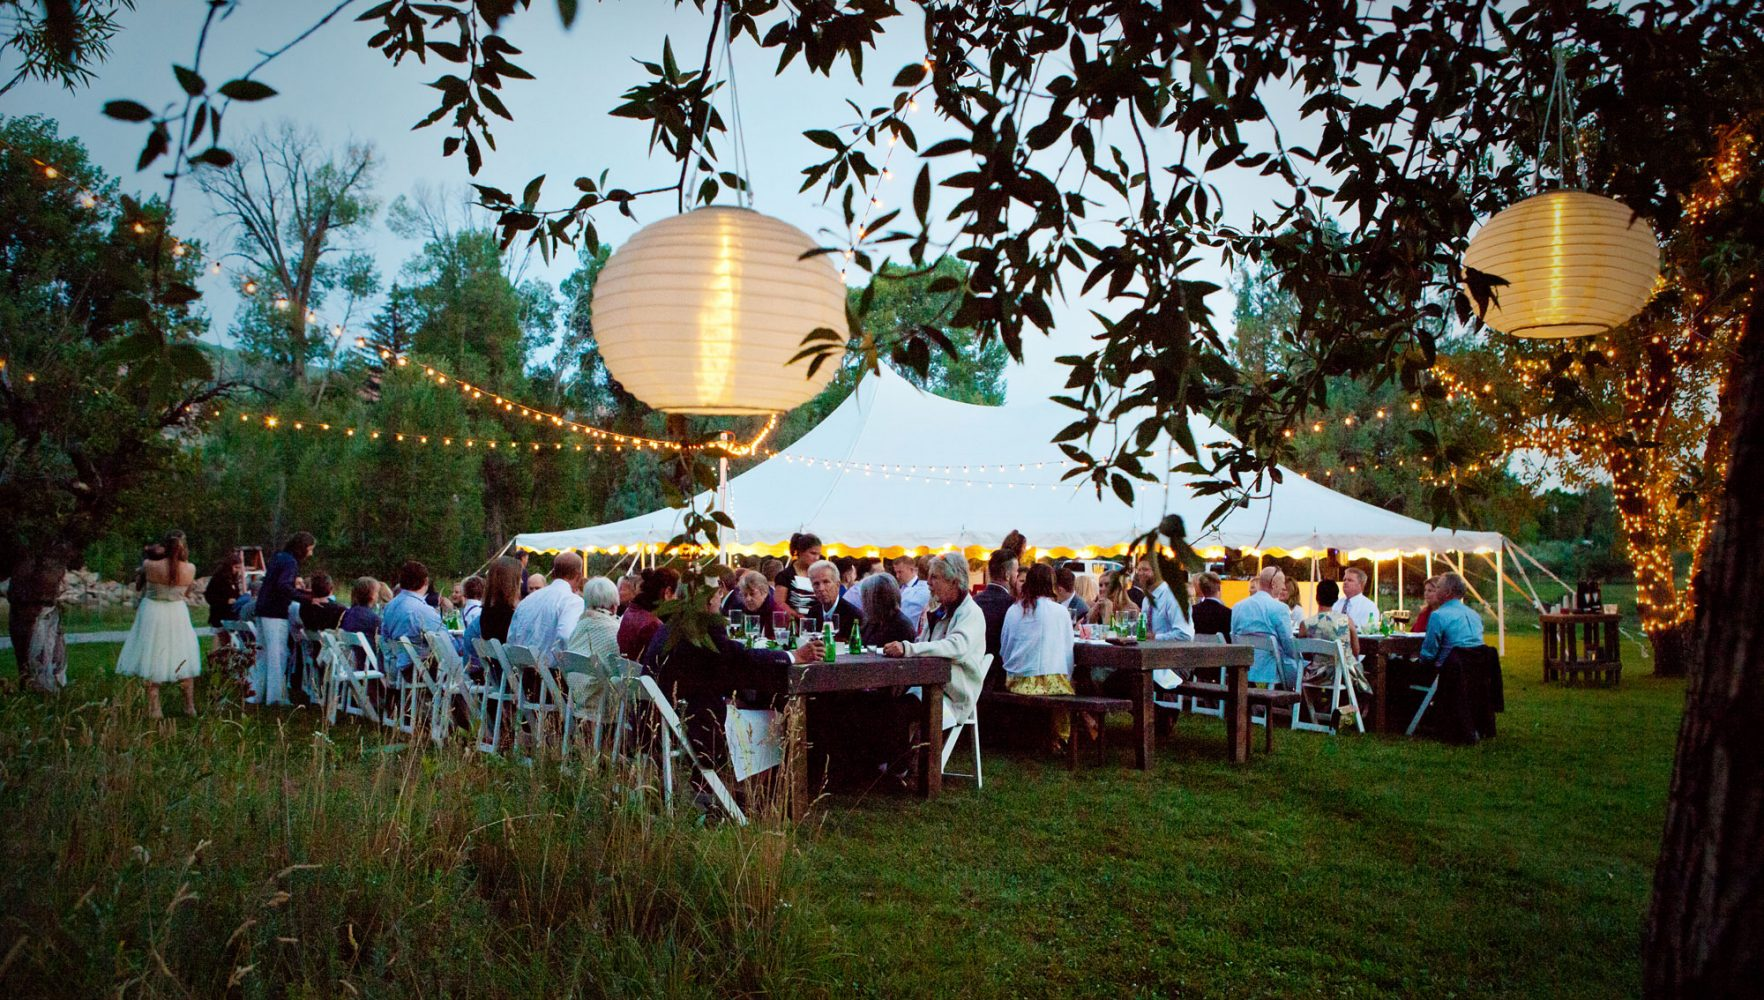 A tent reception fom a backyard wedding on the lawn in the Animas Valley of Durango, Colorado